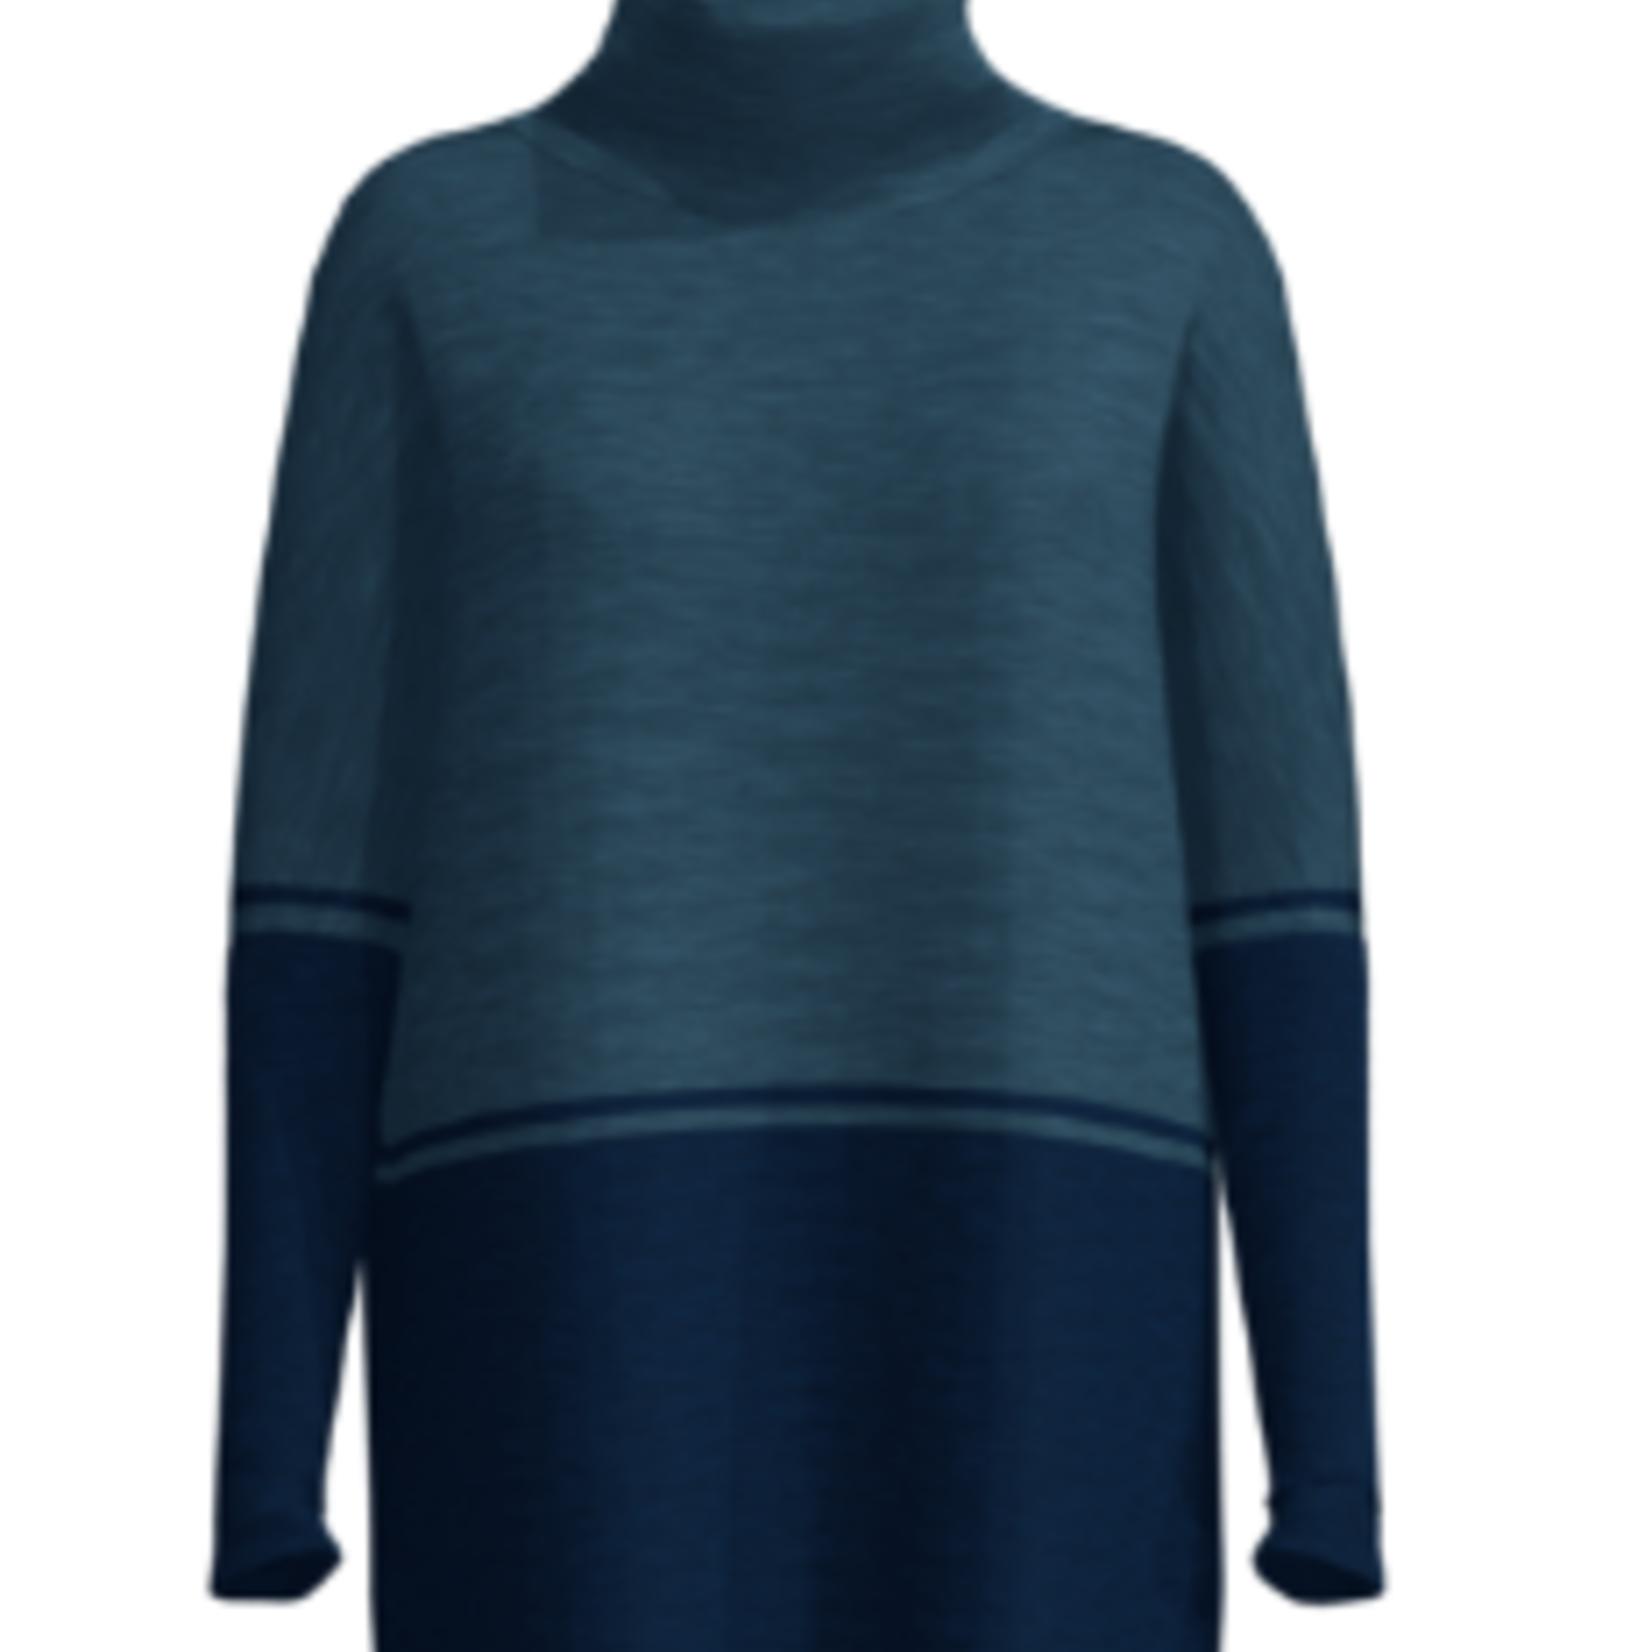 Smartwool Smartwool W's Edgewood Poncho Sweater